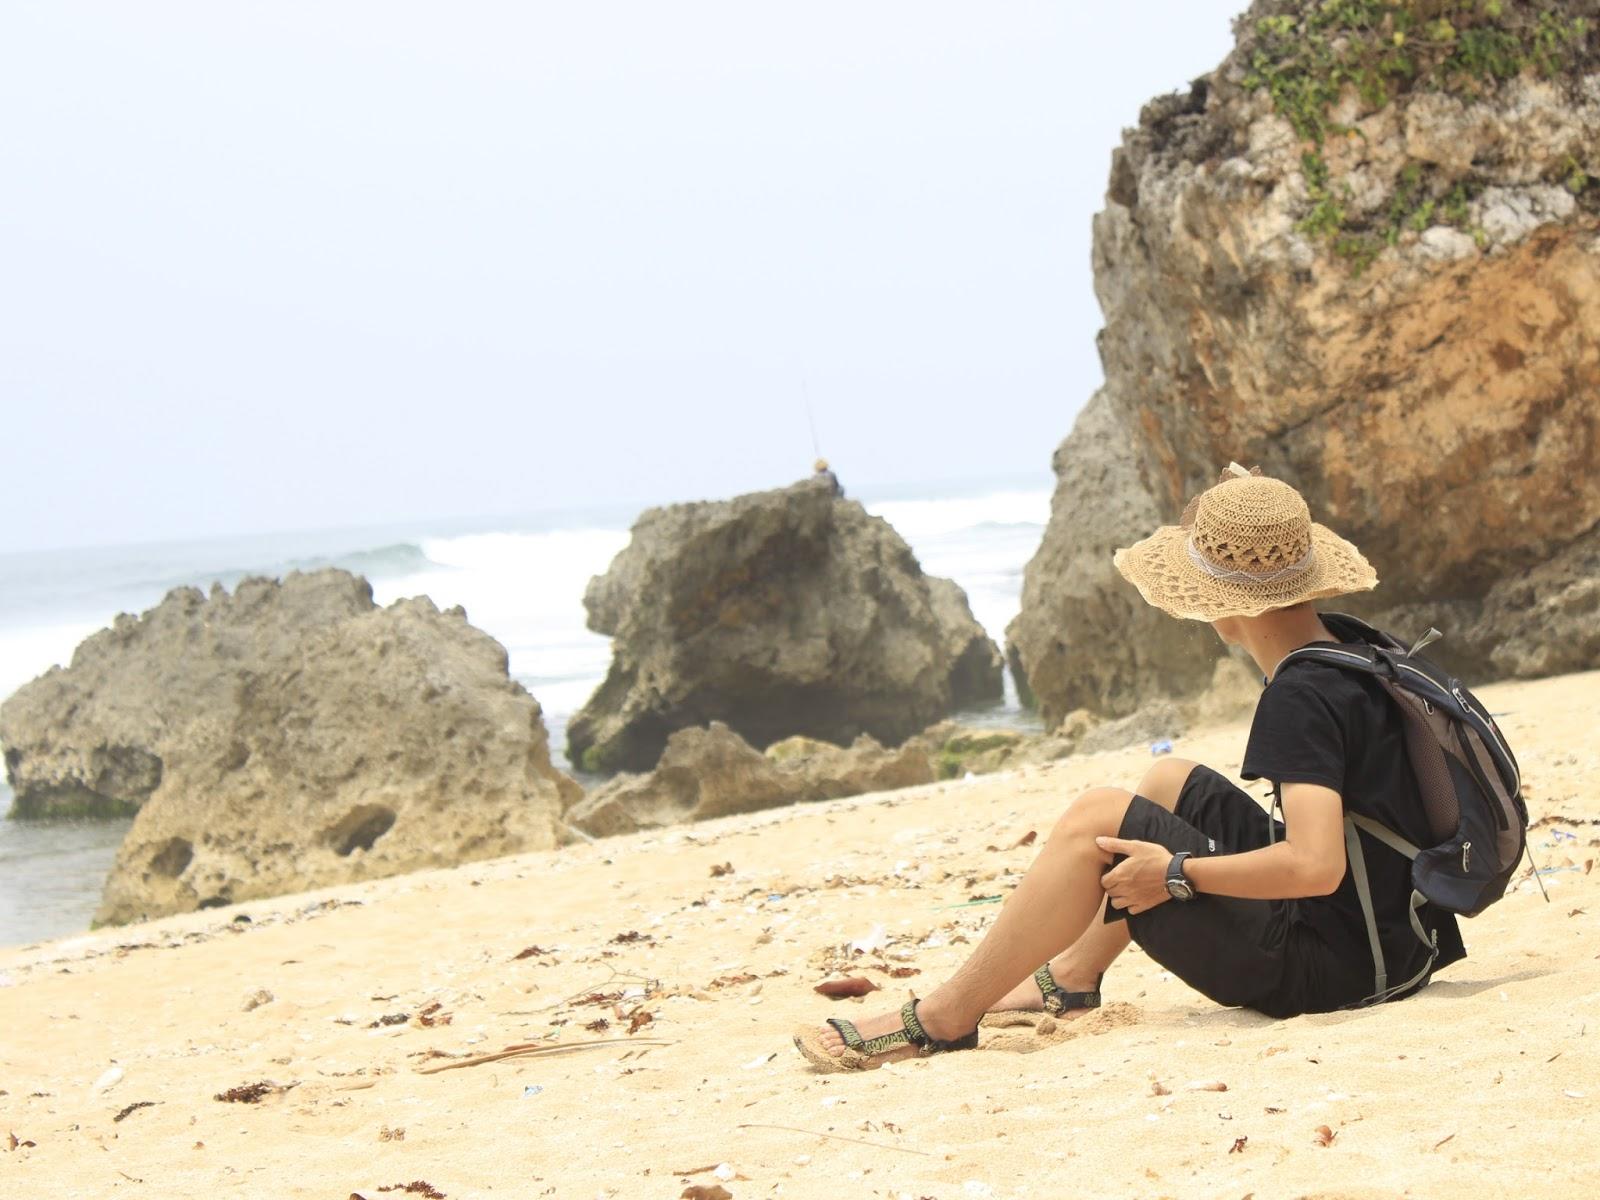 bajak laut topi jerami luffy one piece pantai ngrumput gunungkidul yogyakarta